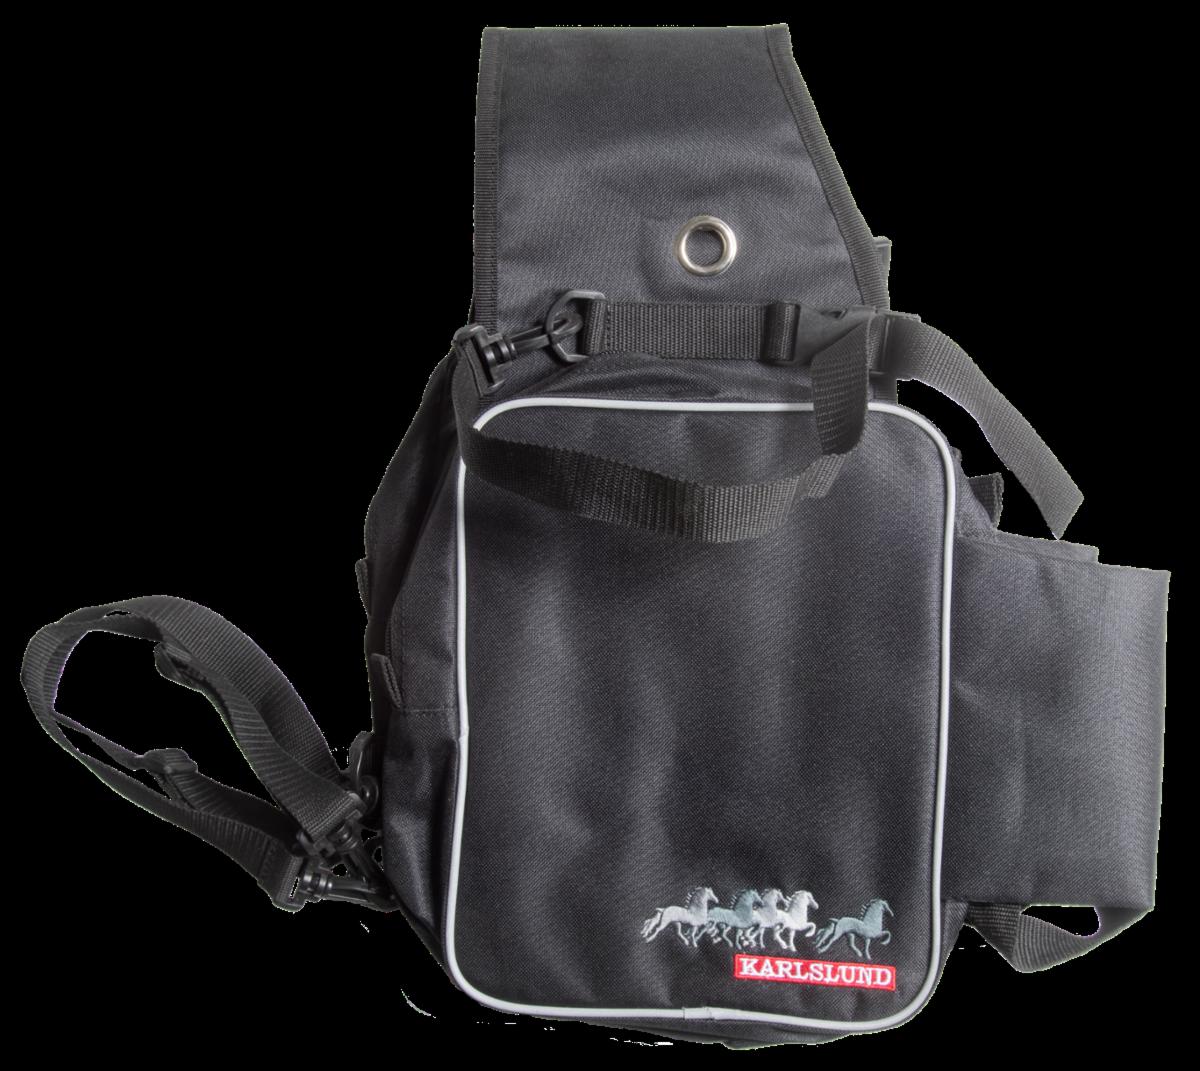 Karlslund Saddle Bags